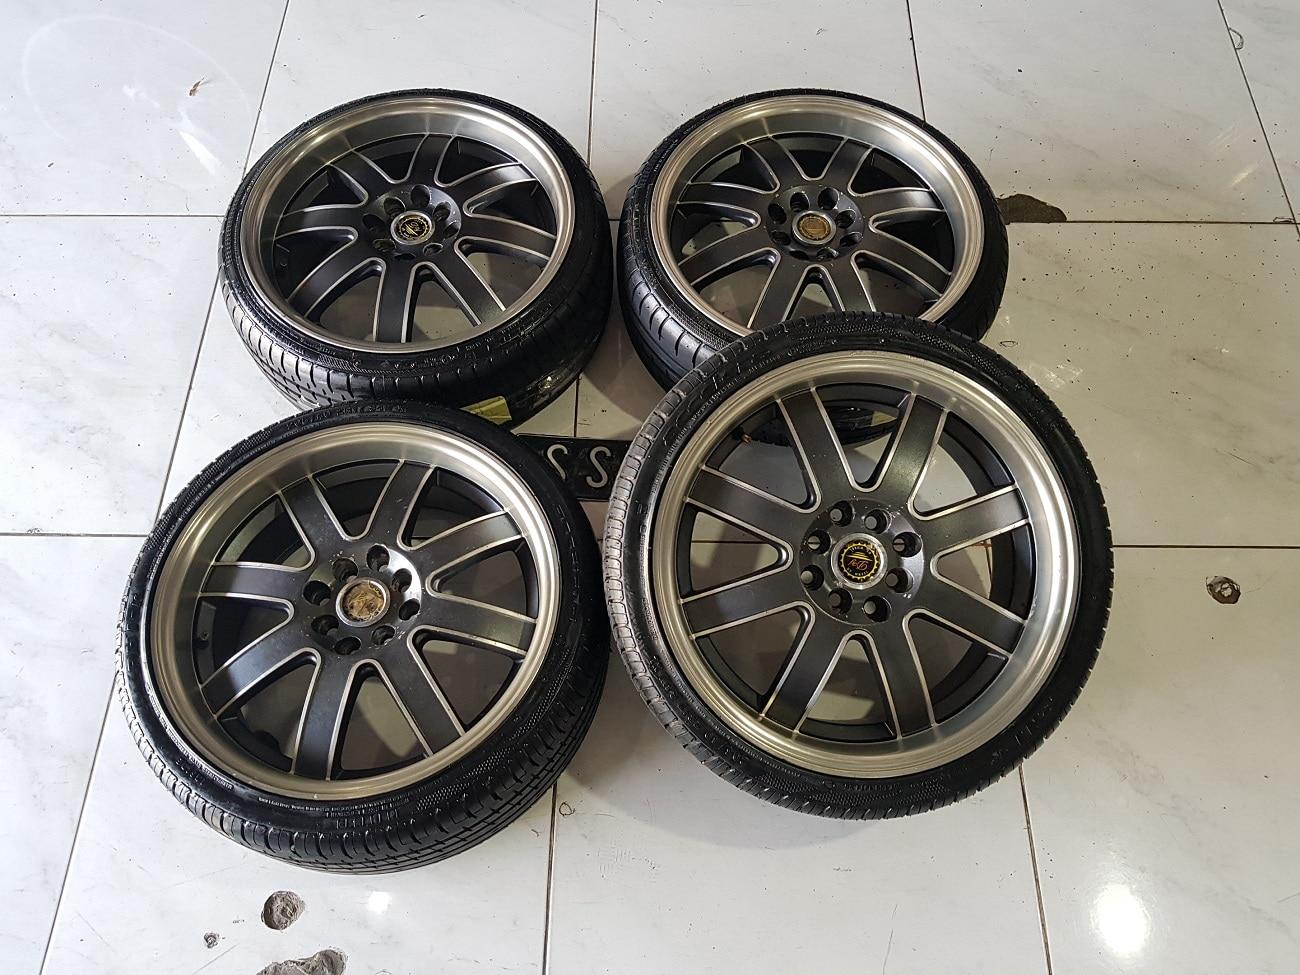 velg dy wheel + ban acelera r17